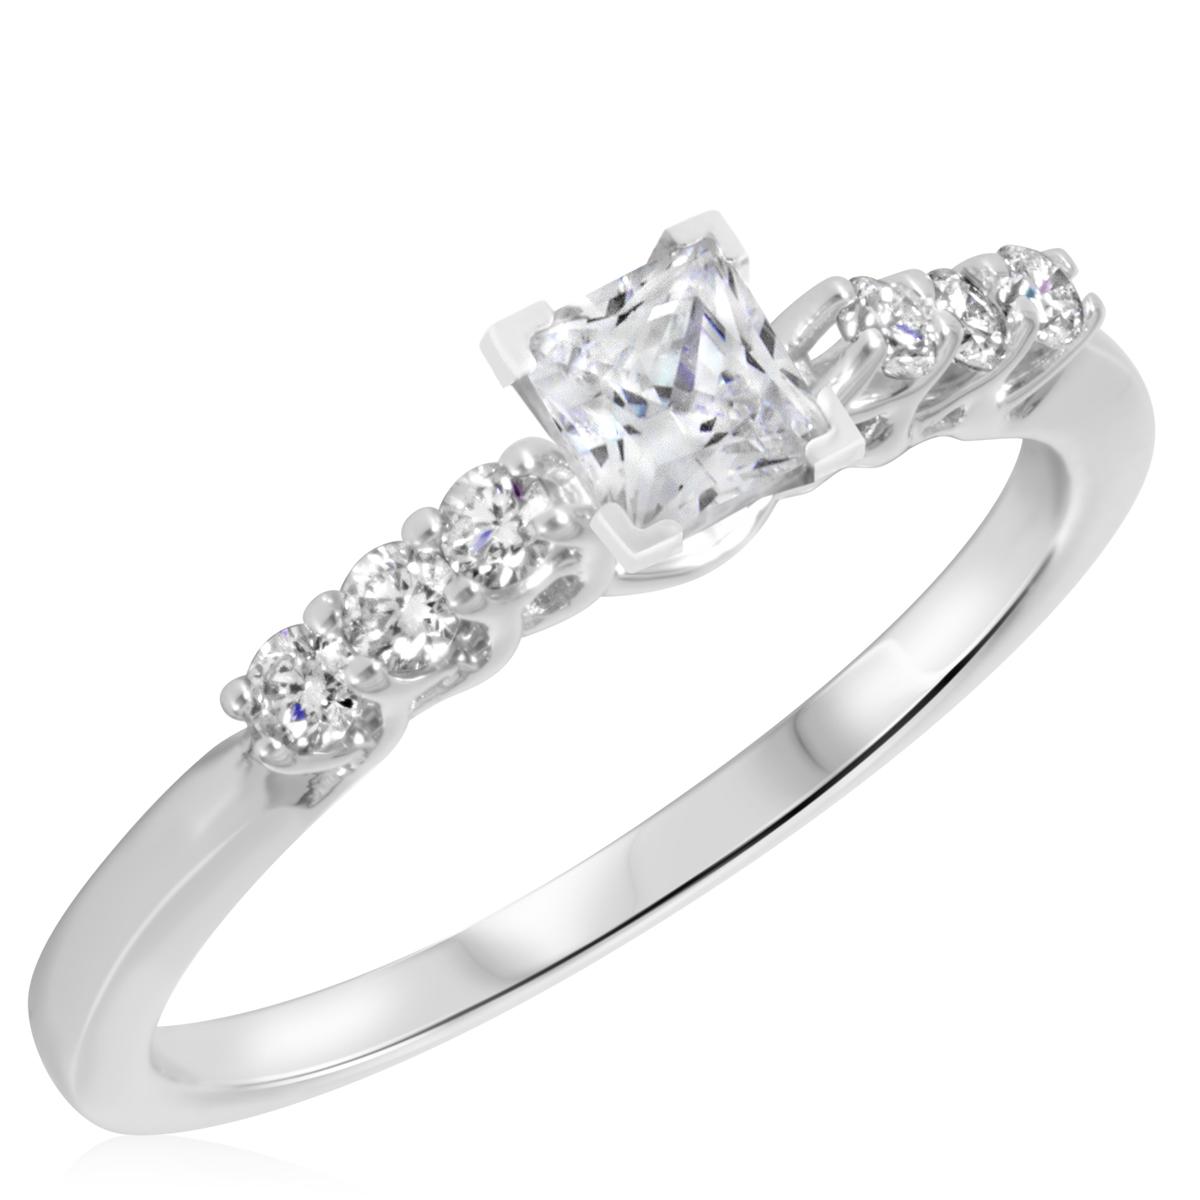 1/2 CT. T.W. Diamond Ladies Engagement Ring 10K White Gold- Size 8